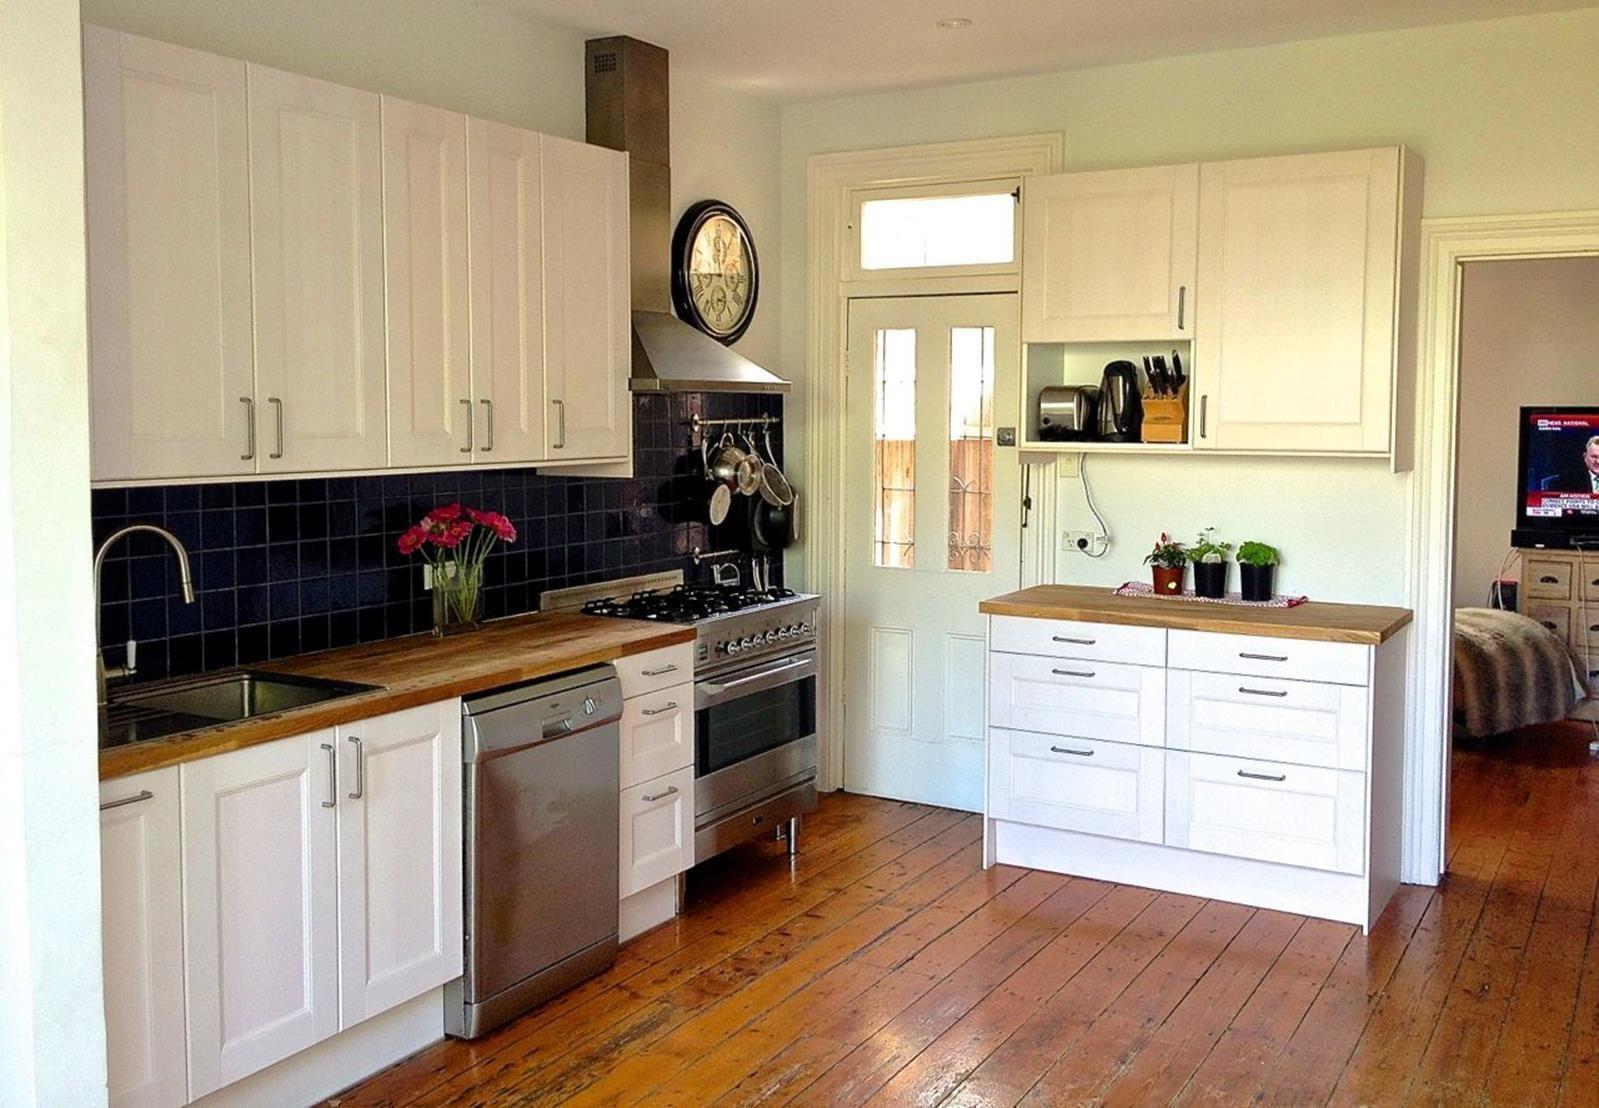 Best Inexpensive White IKEA Kitchen Cabinets 30 | Ikea ...